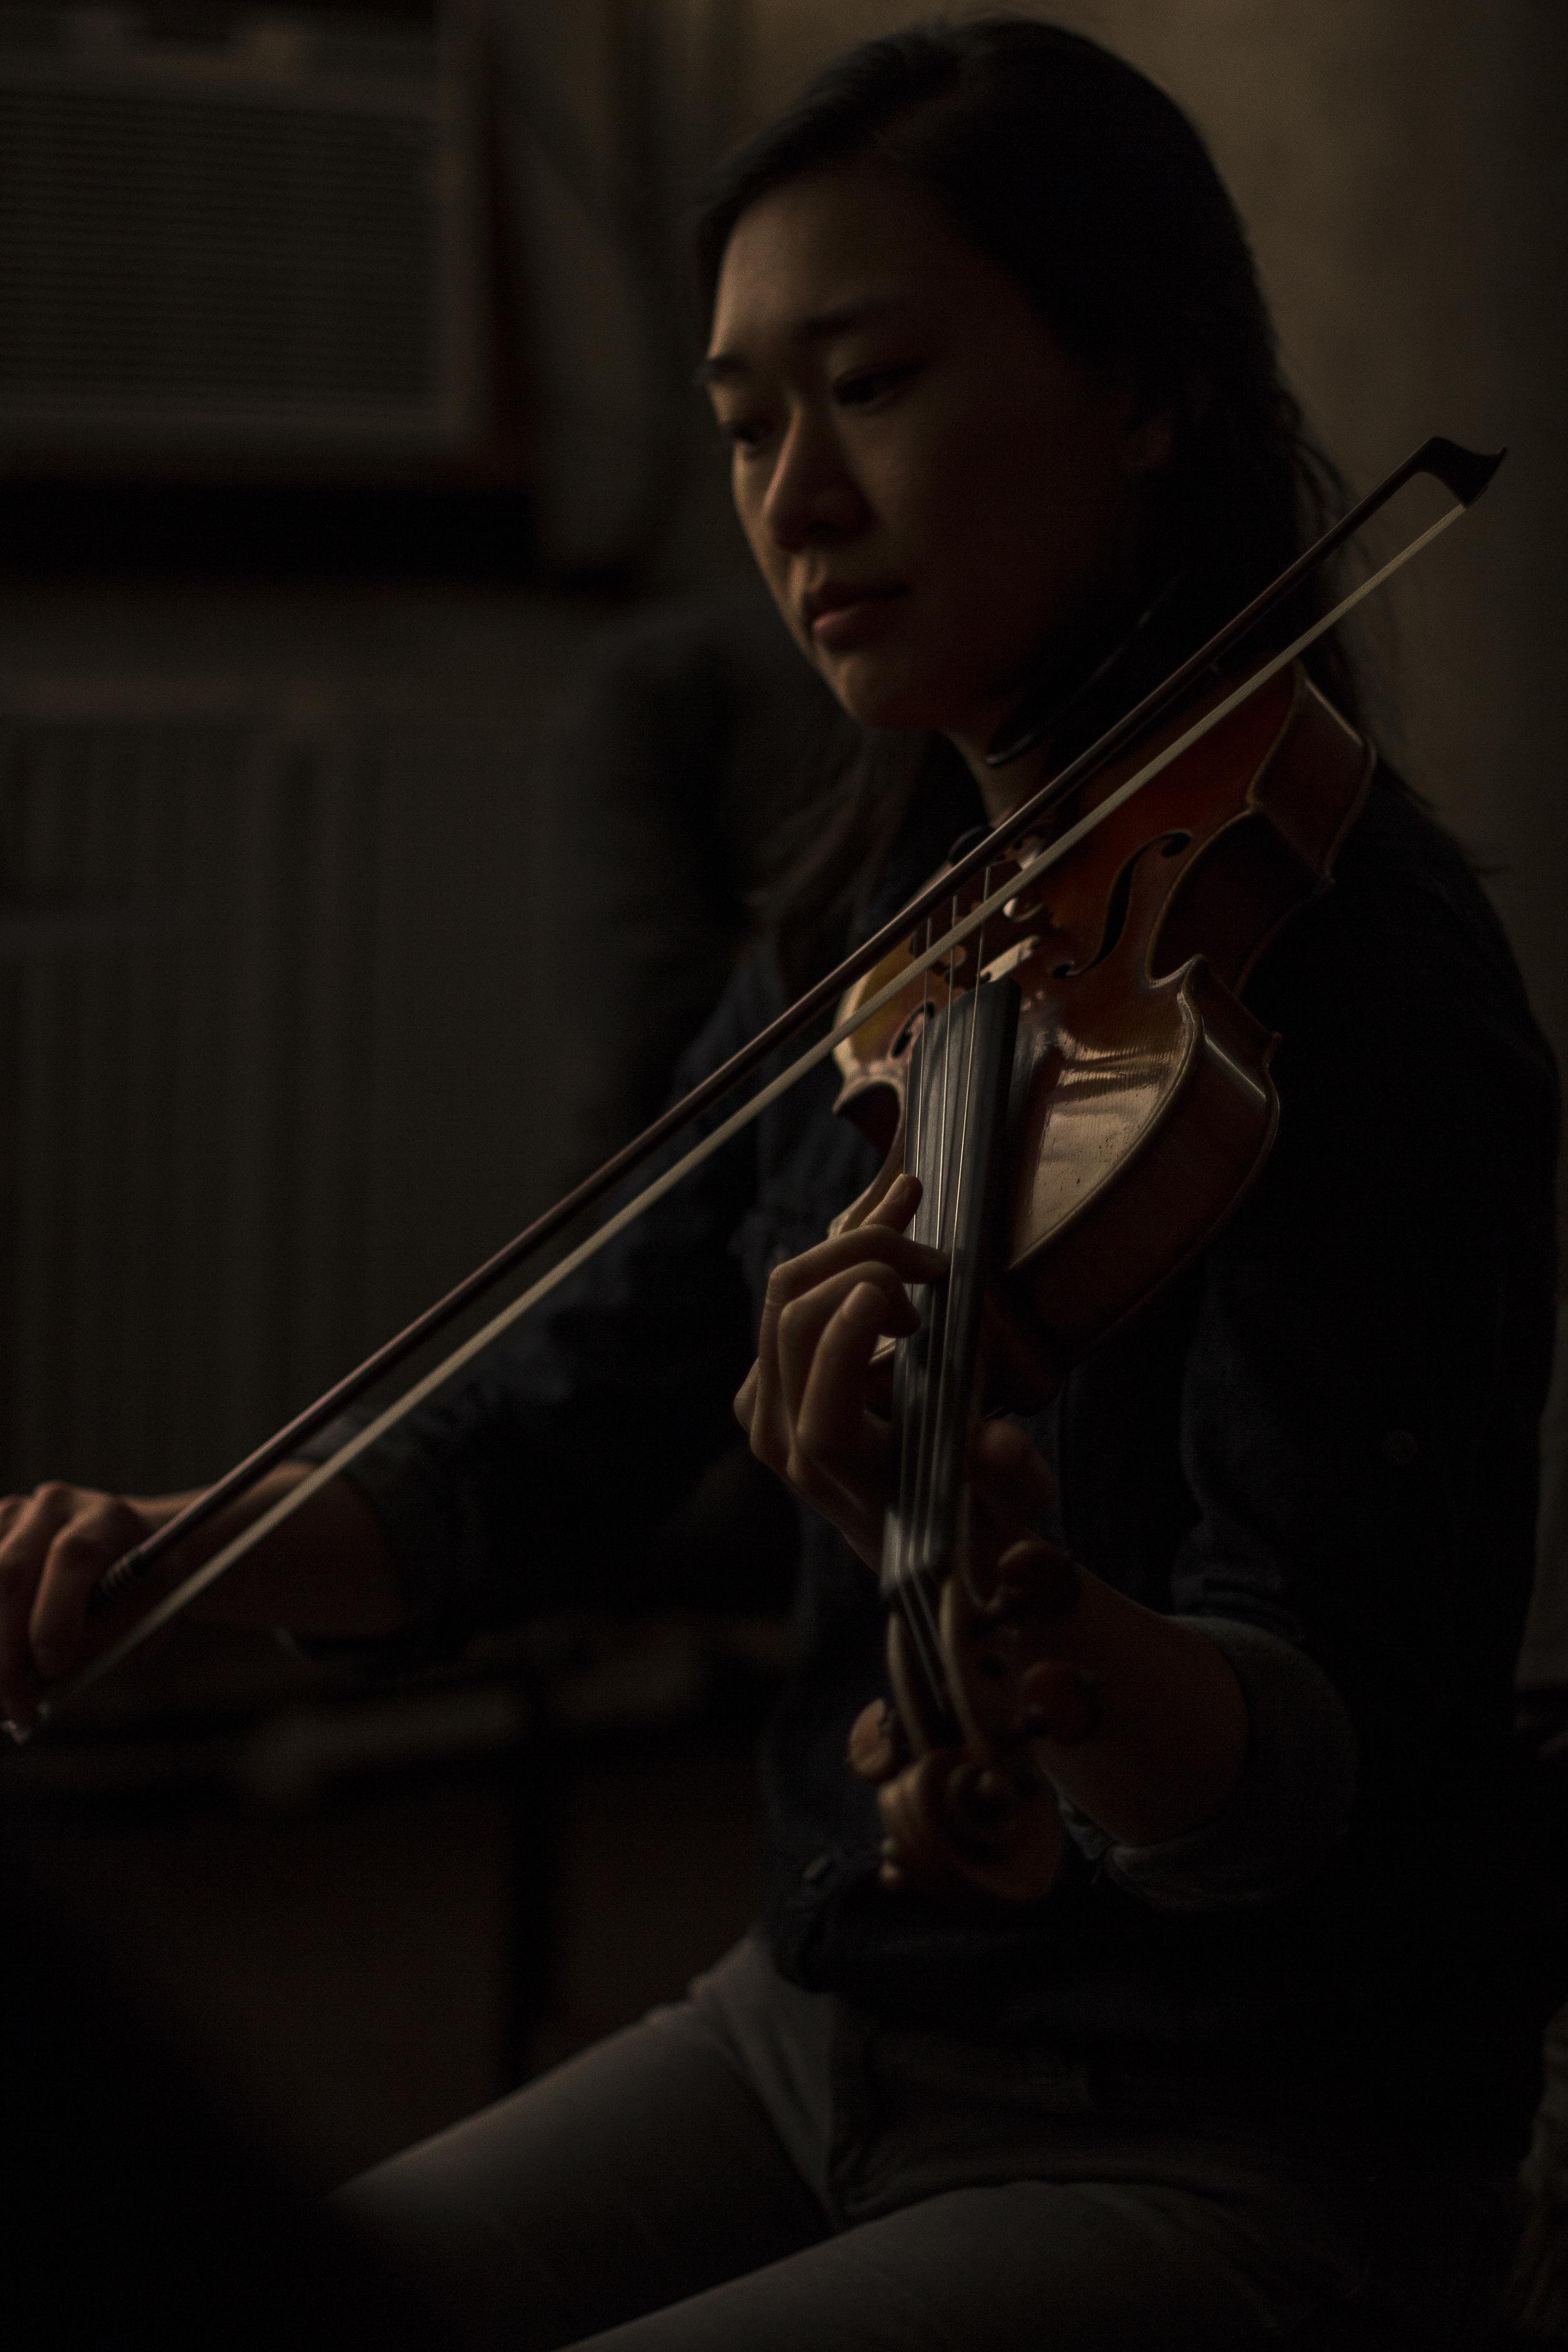 Yvonne Lam, violin, eighth blackbird